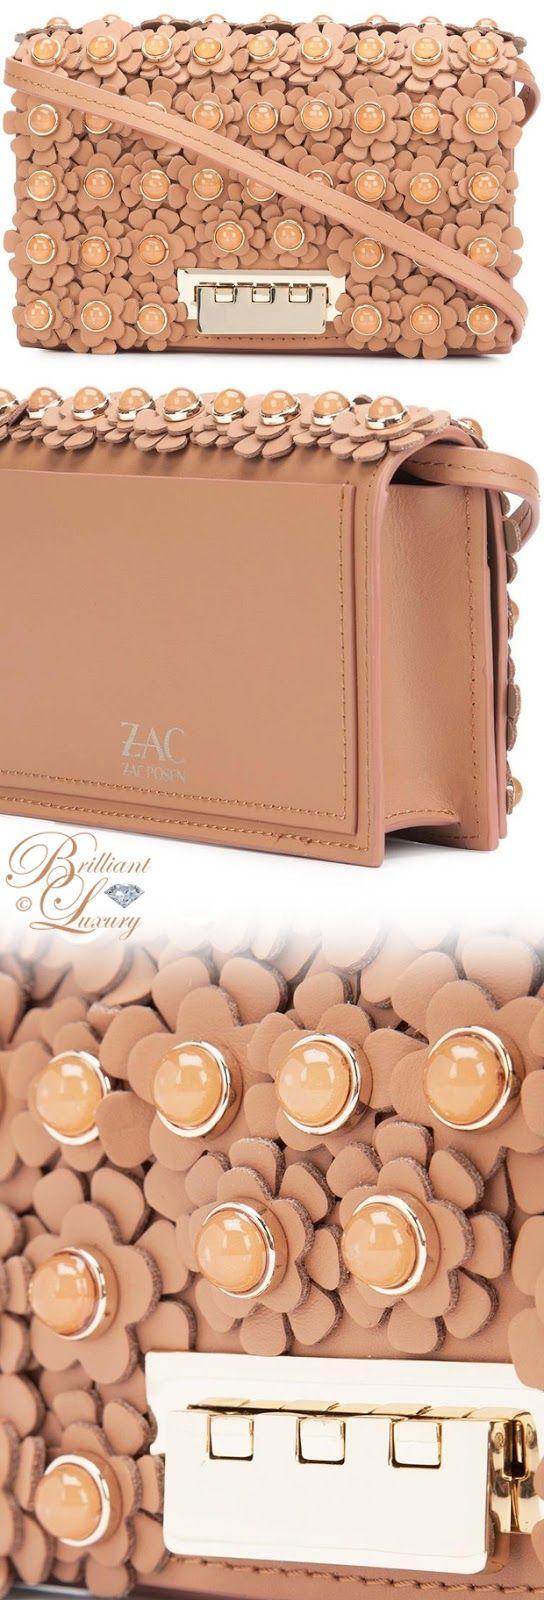 Brilliant Luxury by Emmy DE ♦ Zac Zac Posen Flower Embellished Crossbody Bag